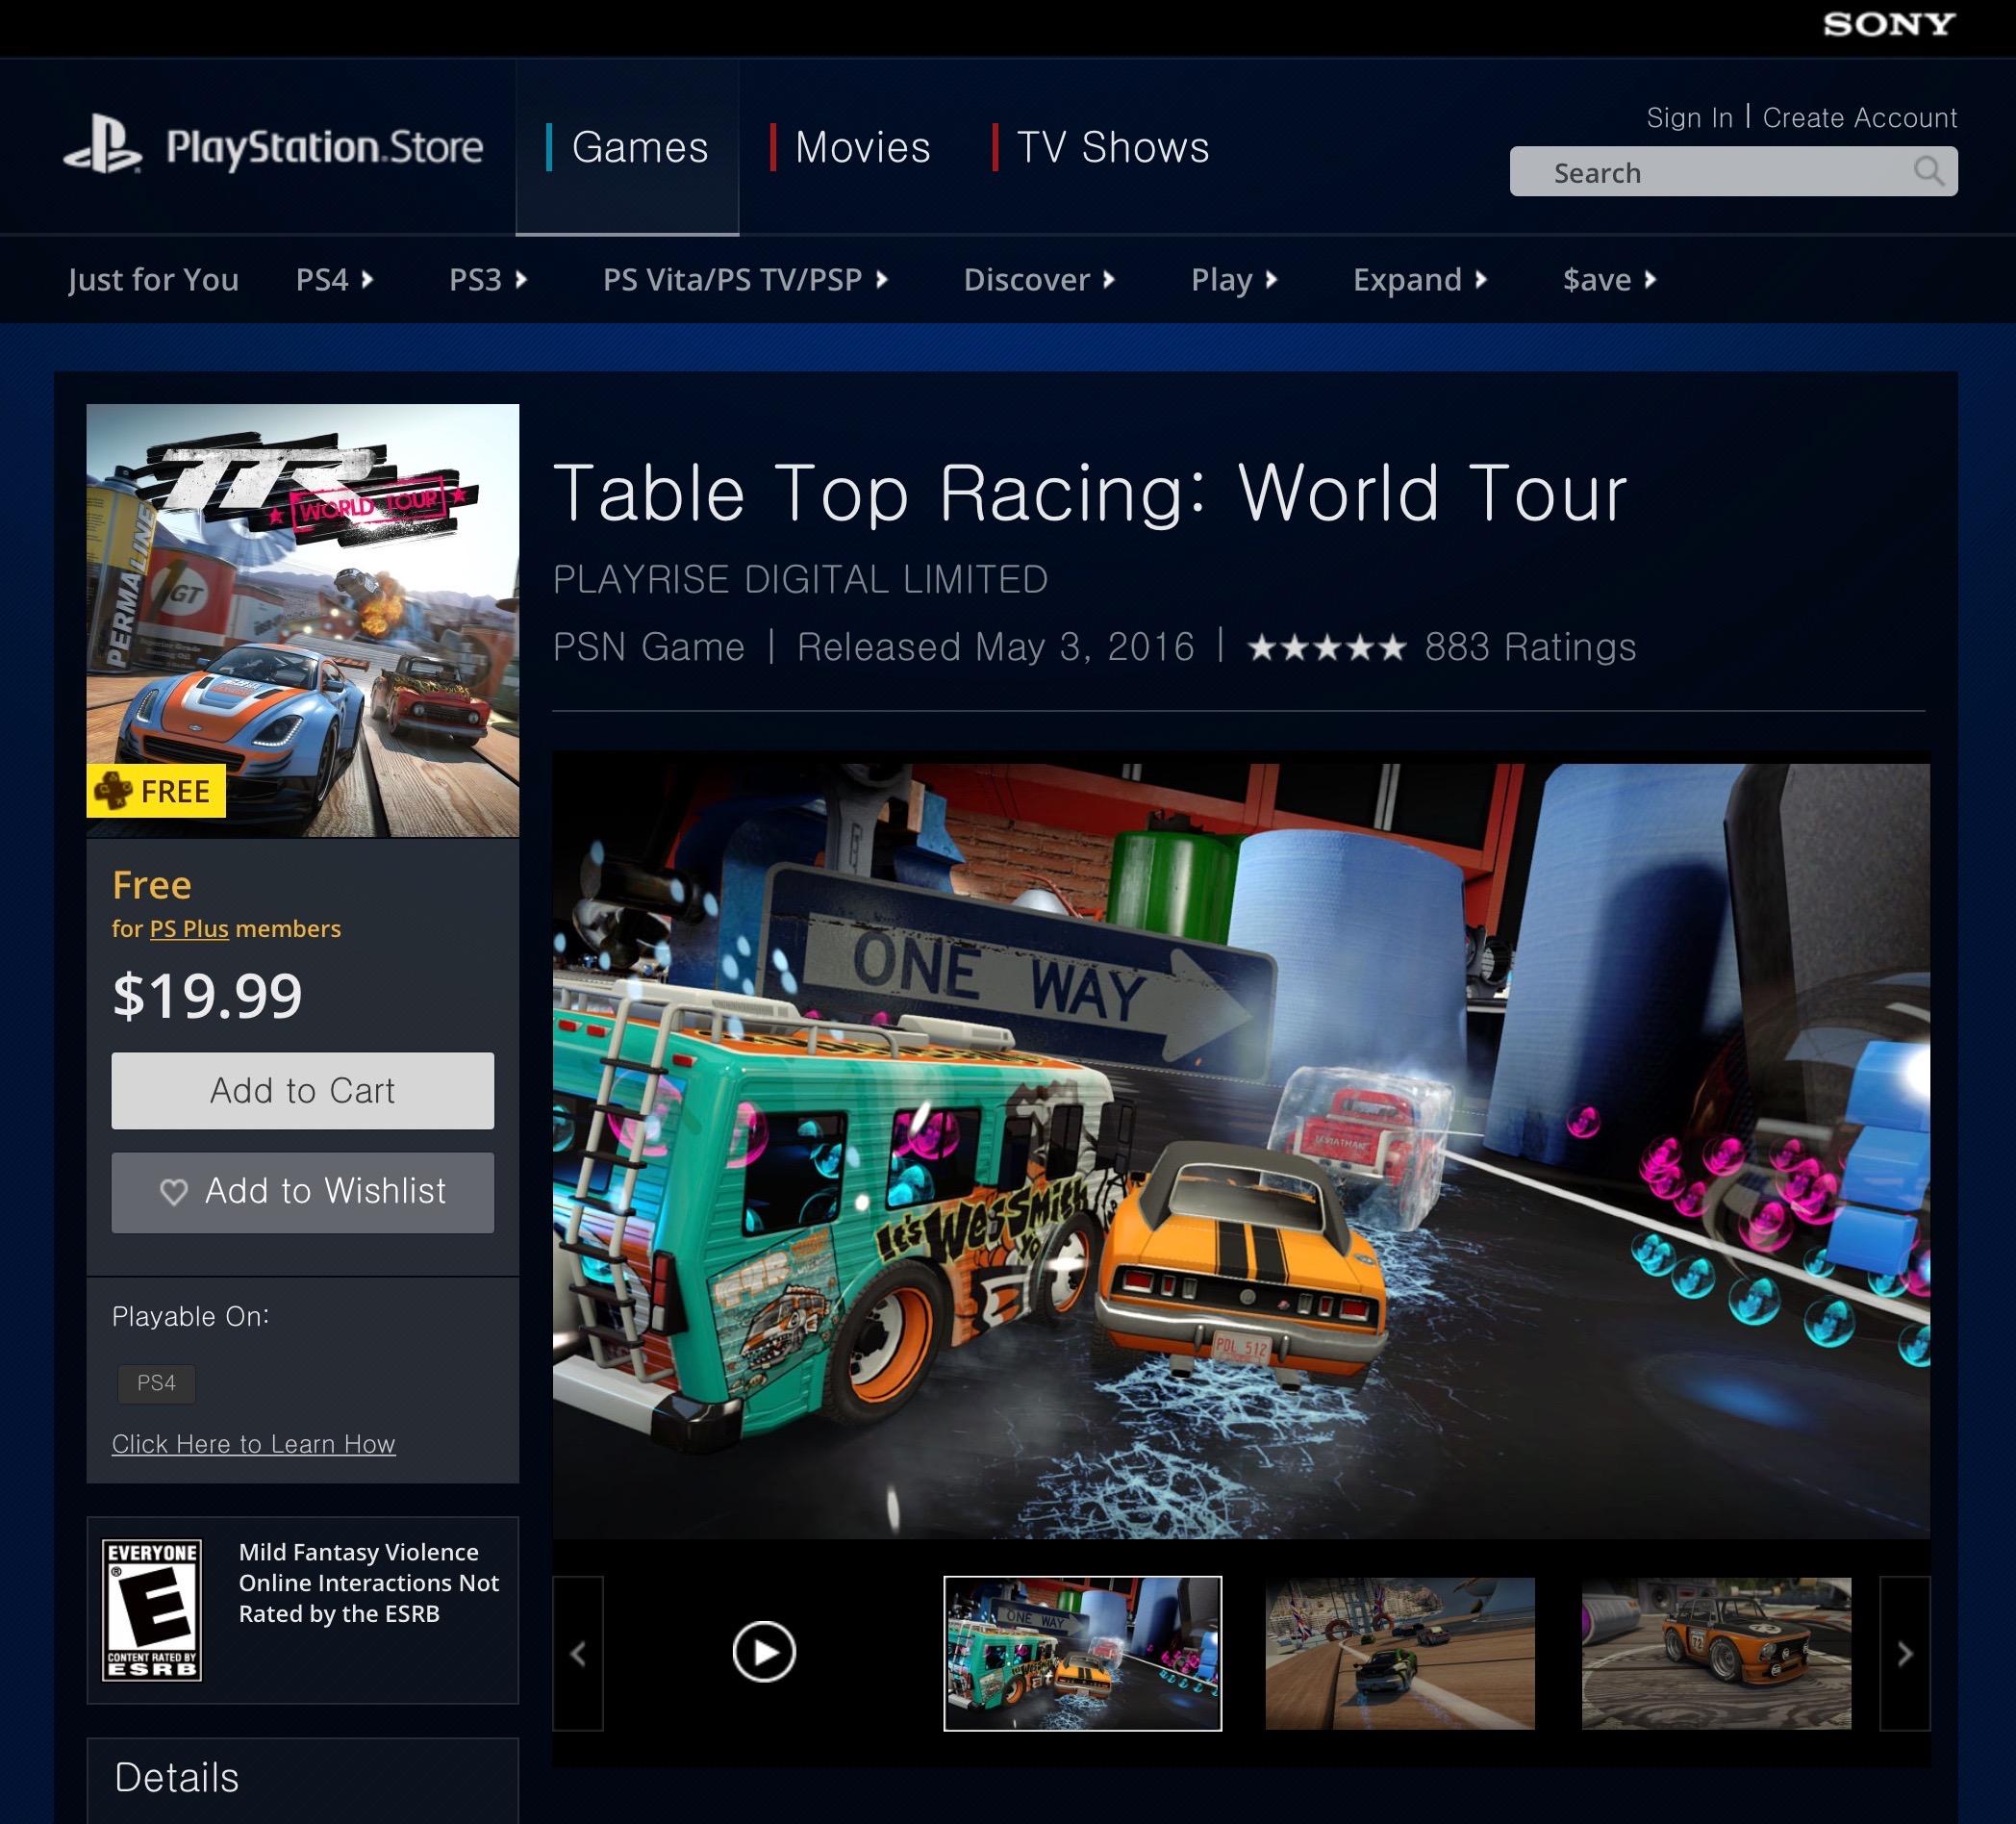 TTRWT_PlaystationStore_Launch_2016-05-03.jpg